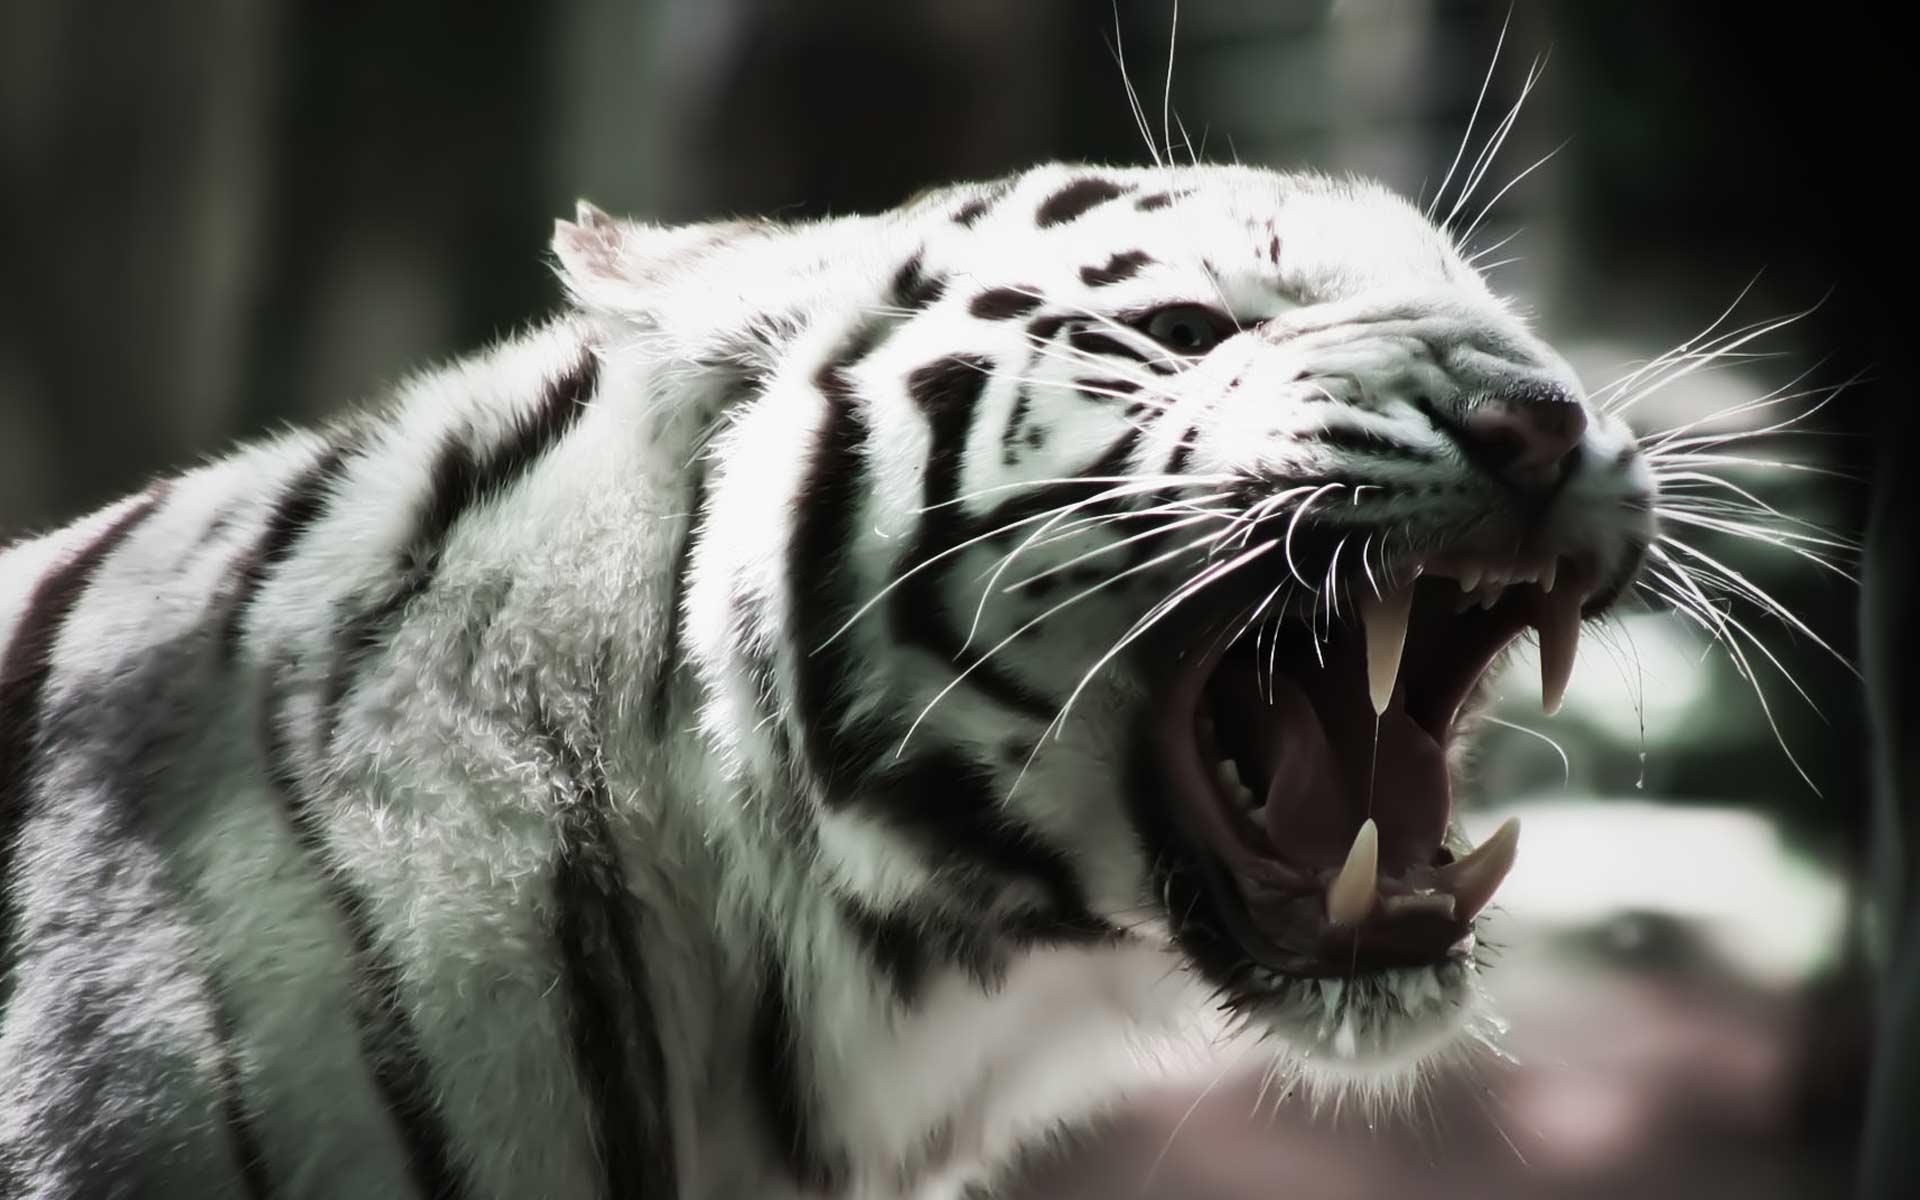 White tiger 25688 1920x1200 px hdwallsource white tiger 25688 voltagebd Images